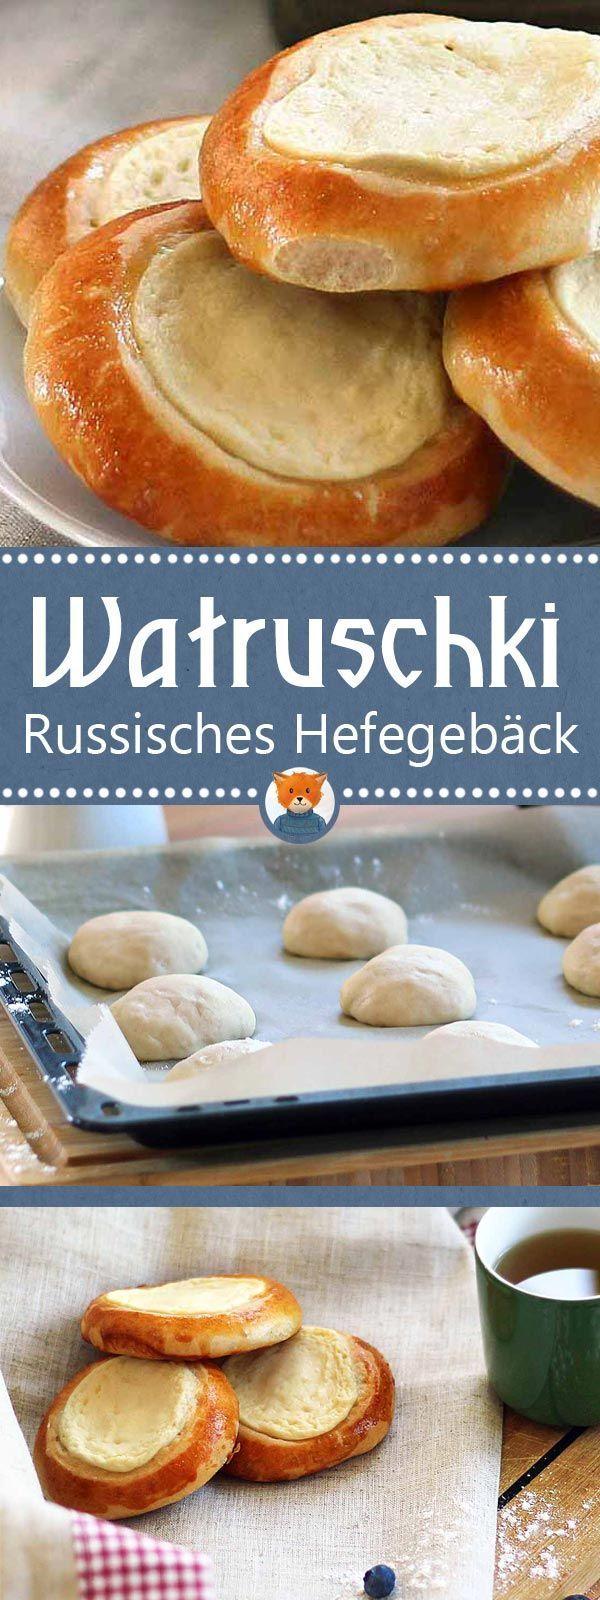 Watruschki (Russisches Gebäck mit Quark) Rezept | familienfuchs �